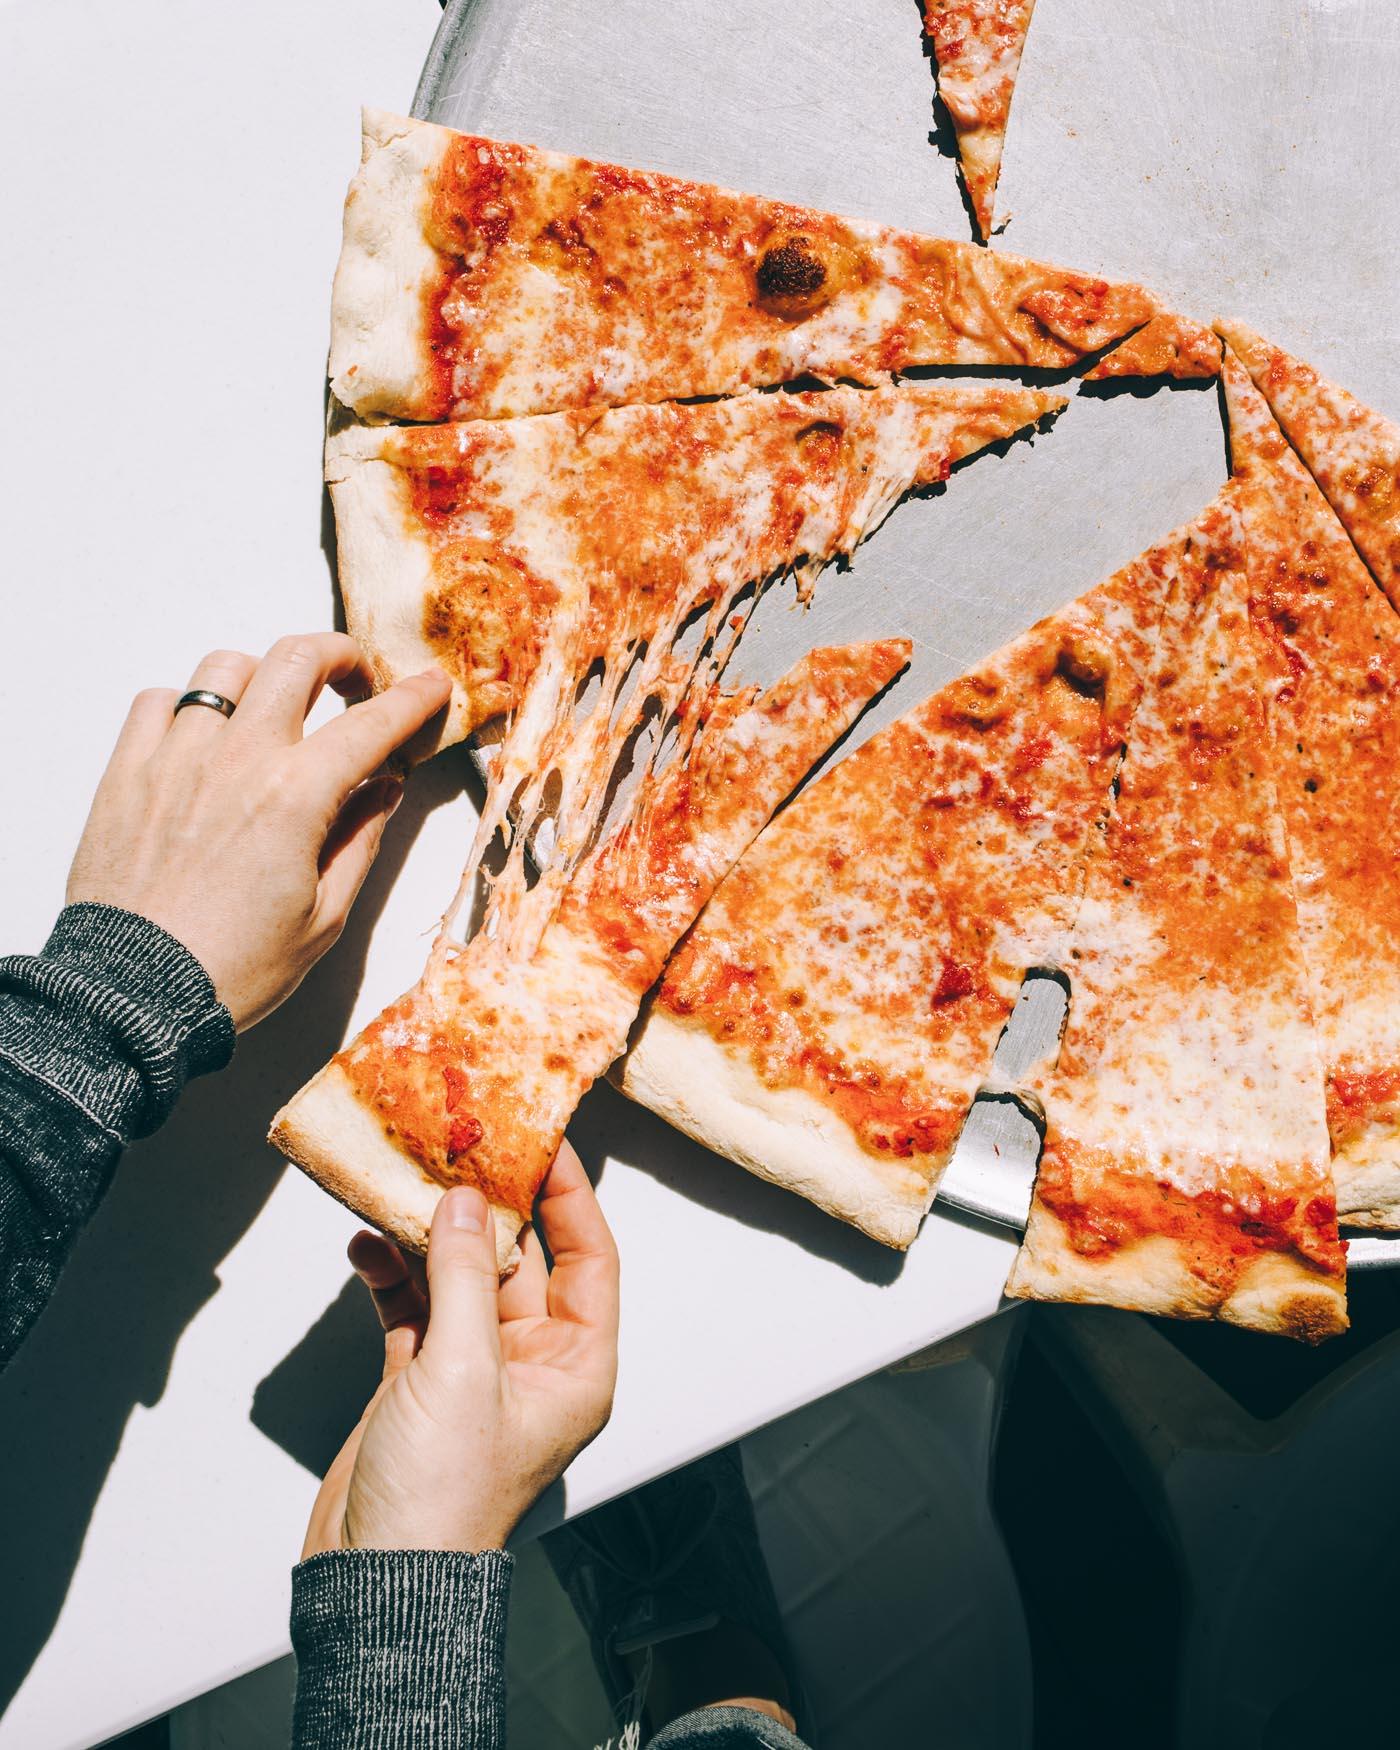 feast-of-st-pizza-ocnj-009.jpg